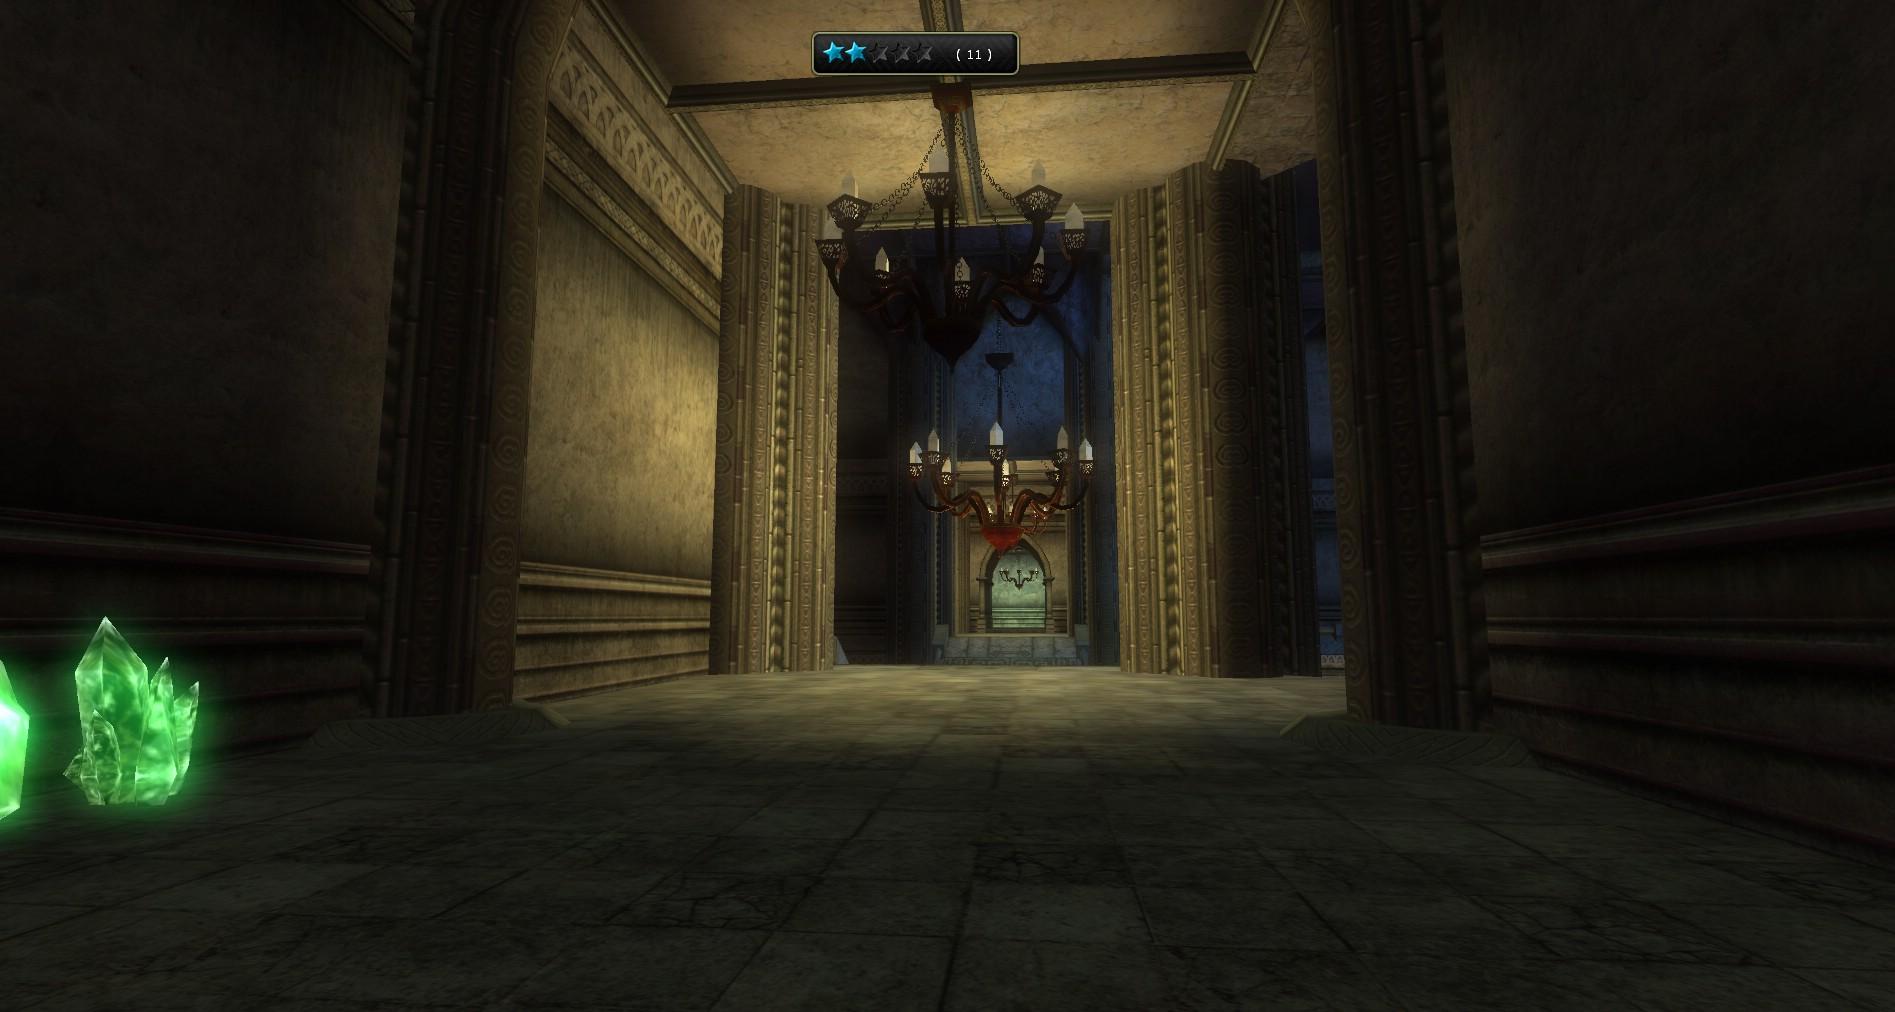 u12-extraplanar-palace-long-hallway